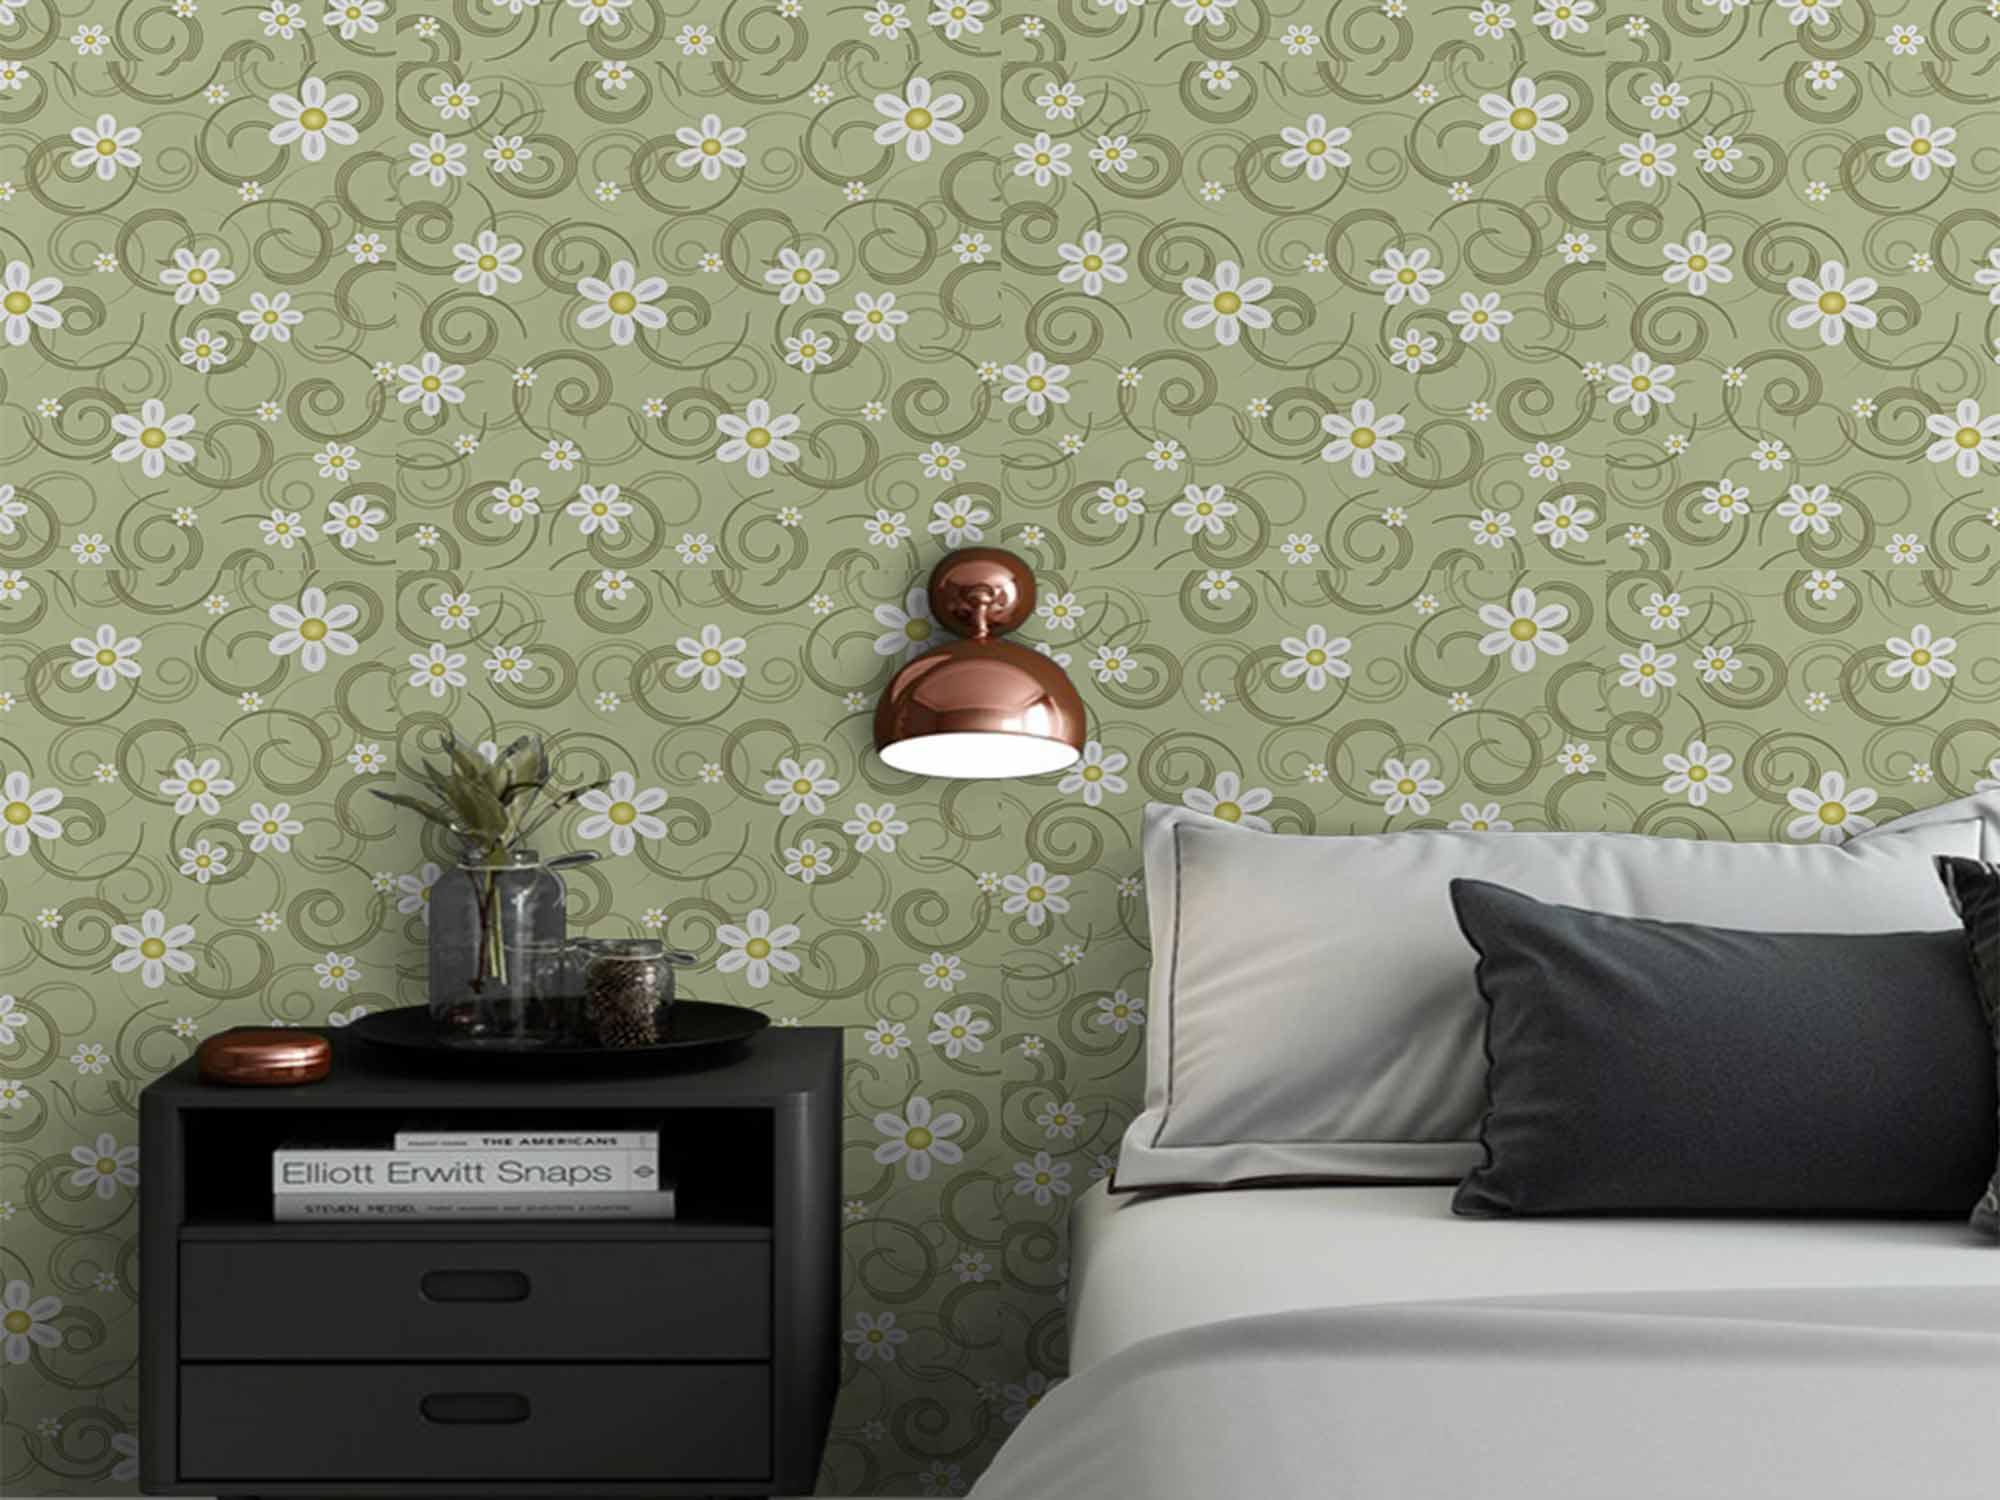 Papel de Parede Floral 0075 - Adesivos de Parede  - Paredes Decoradas